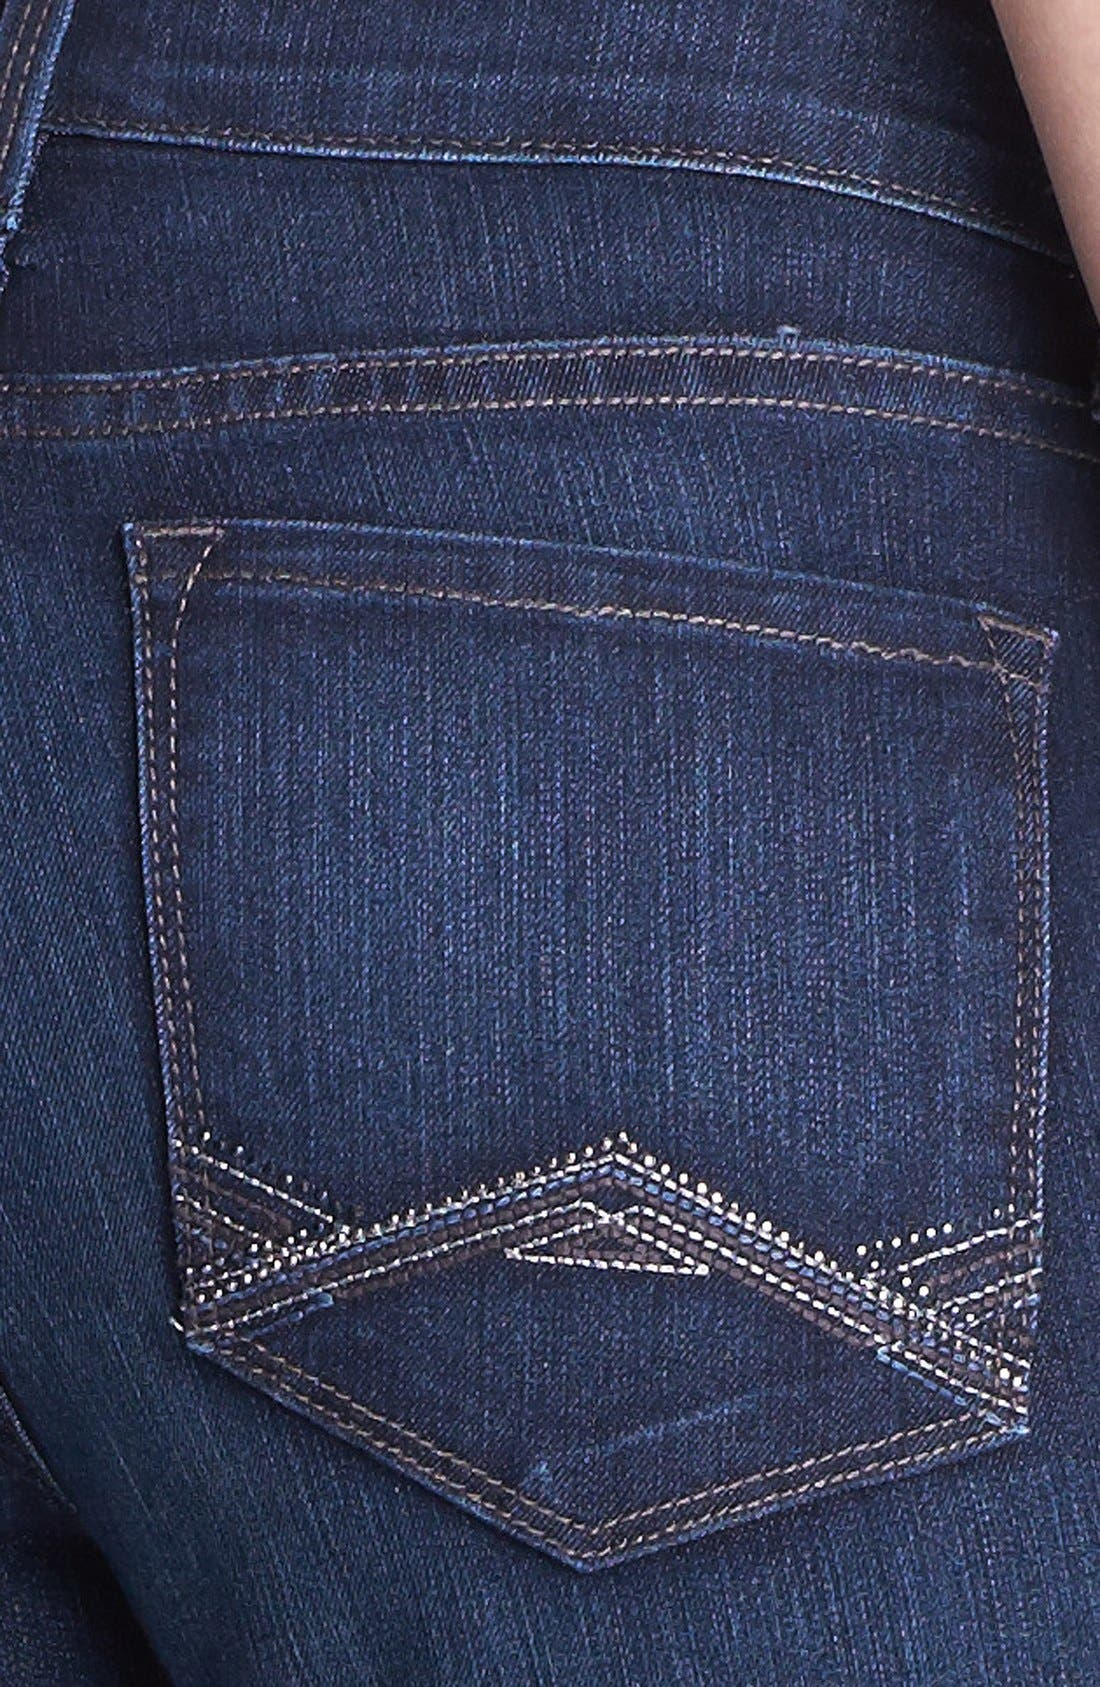 Alternate Image 3  - NYDJ 'Barbara' Embellished Stretch Bootcut Jeans (Online Only)